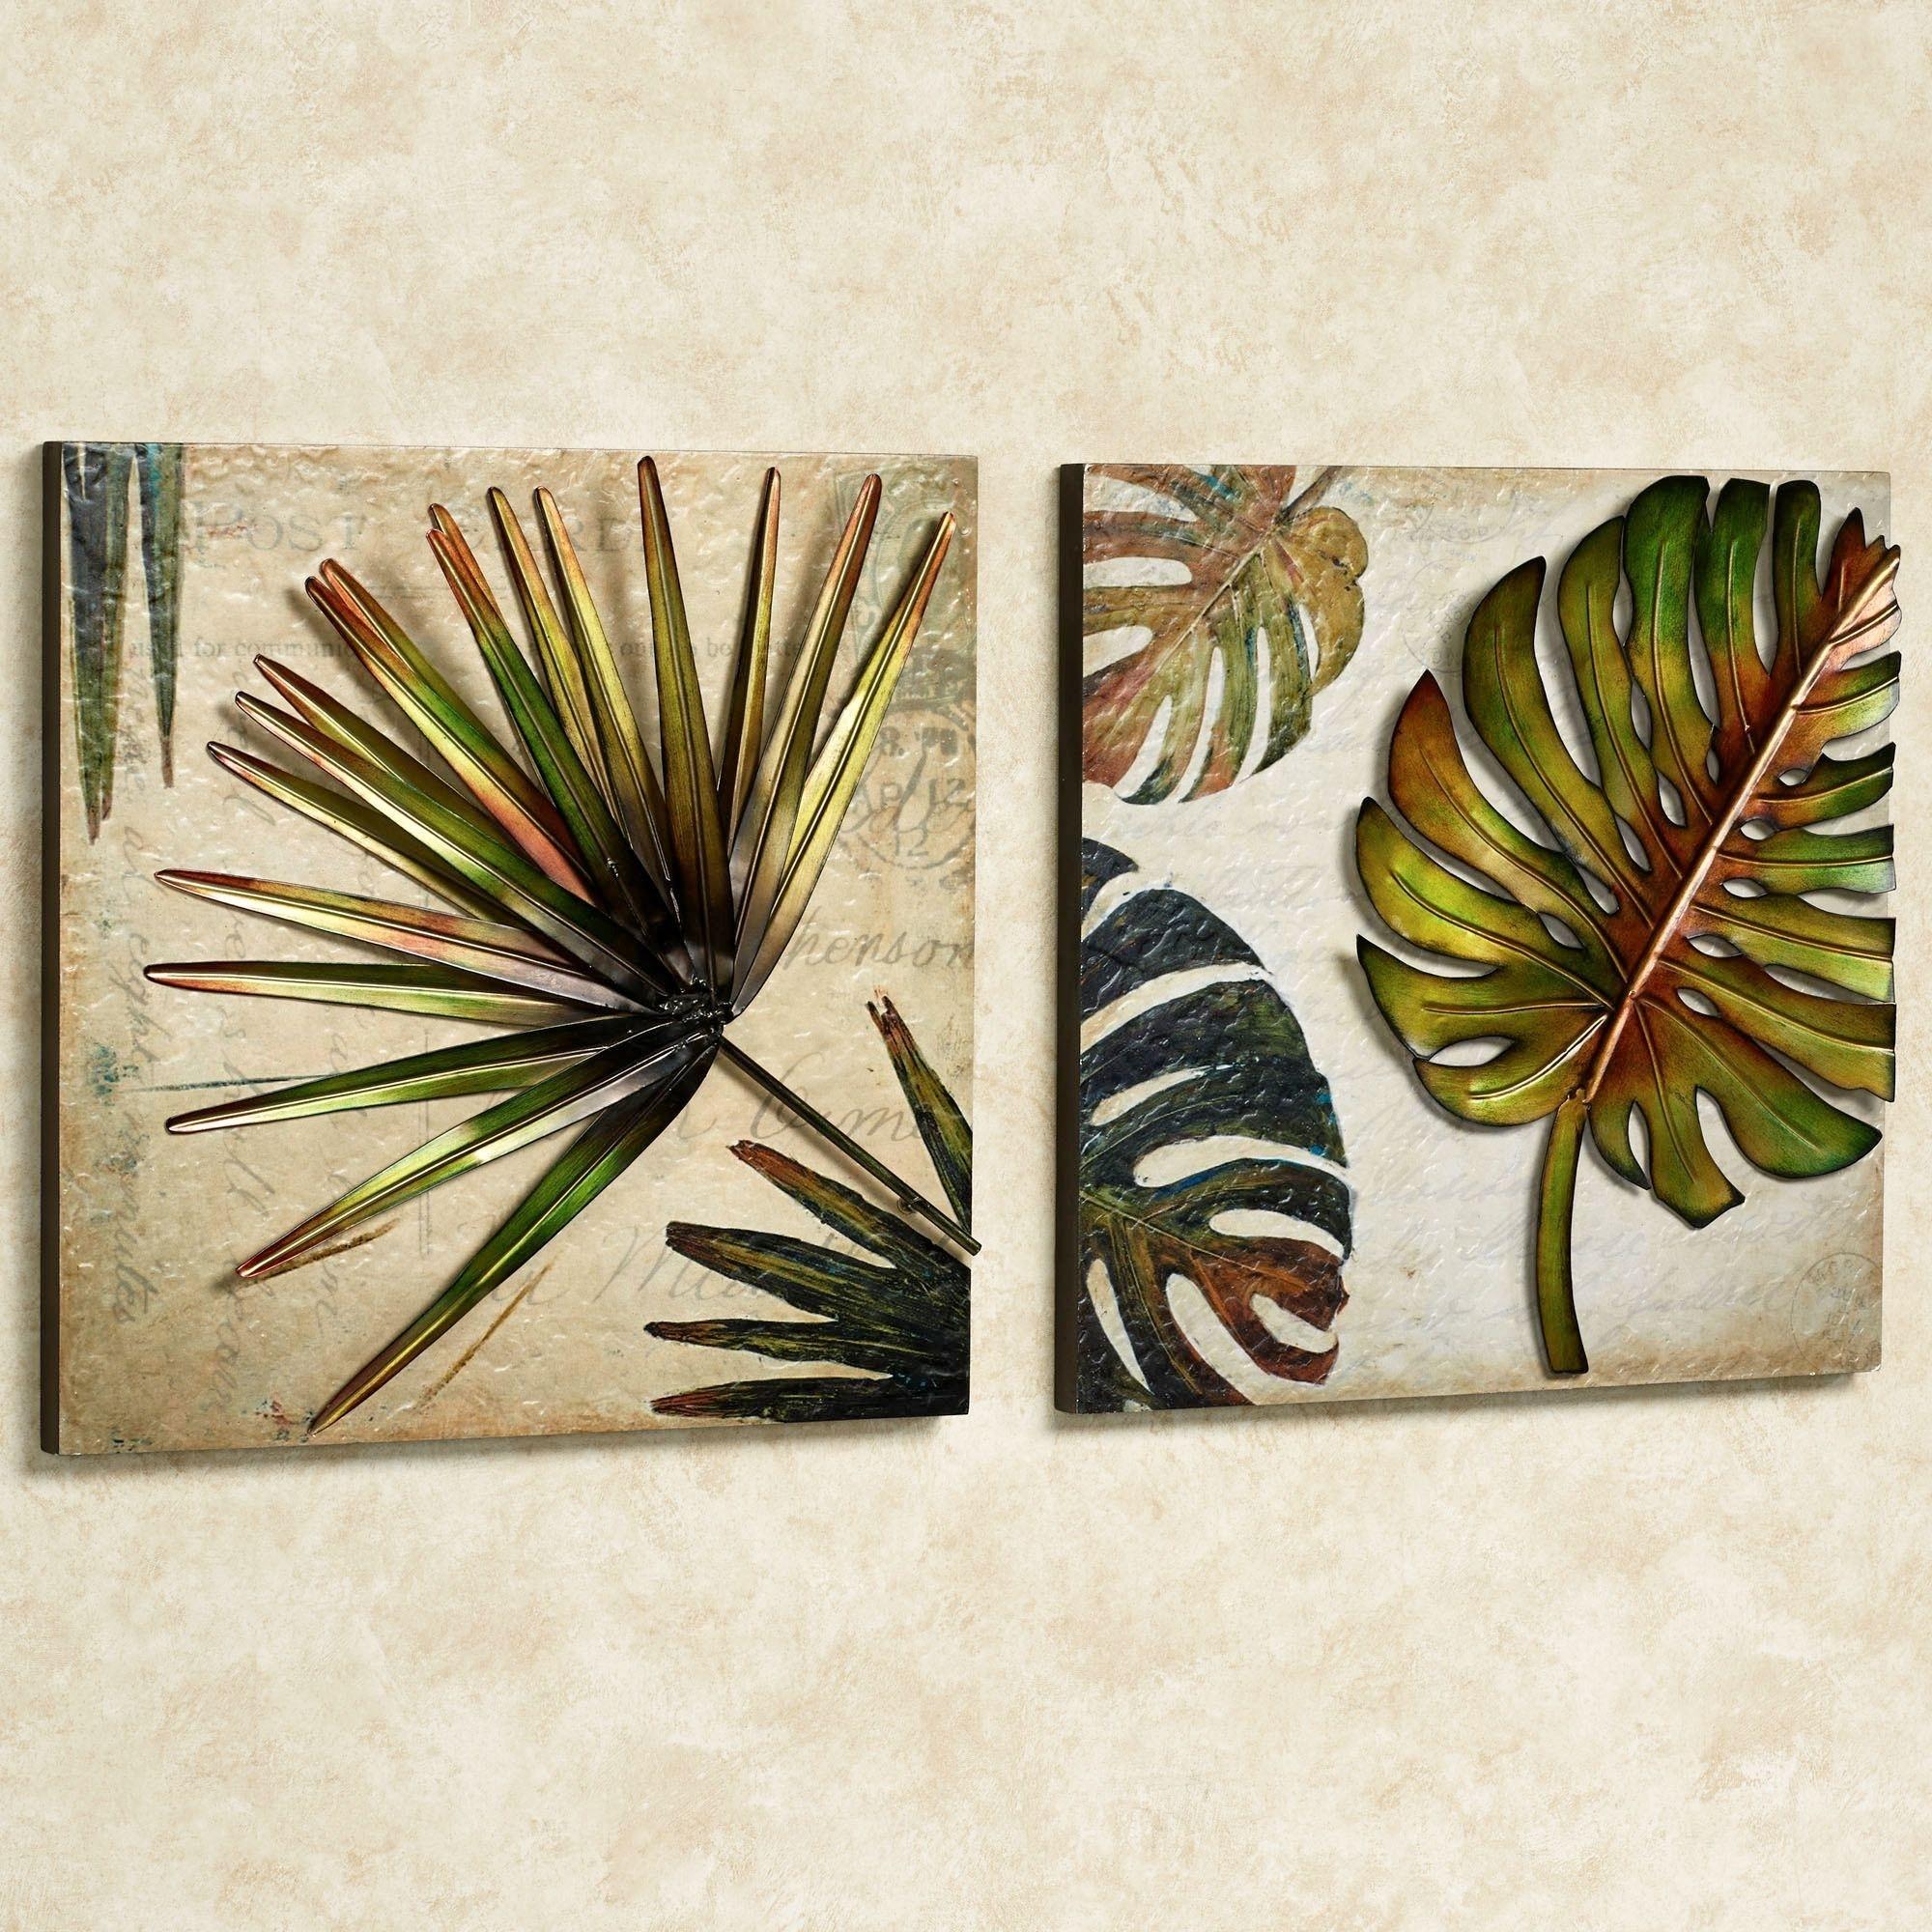 Tropical Impressions Dimensional Wall Art Set | Wall Art Sets, Walls For Most Current Tropical Wall Art (View 1 of 20)